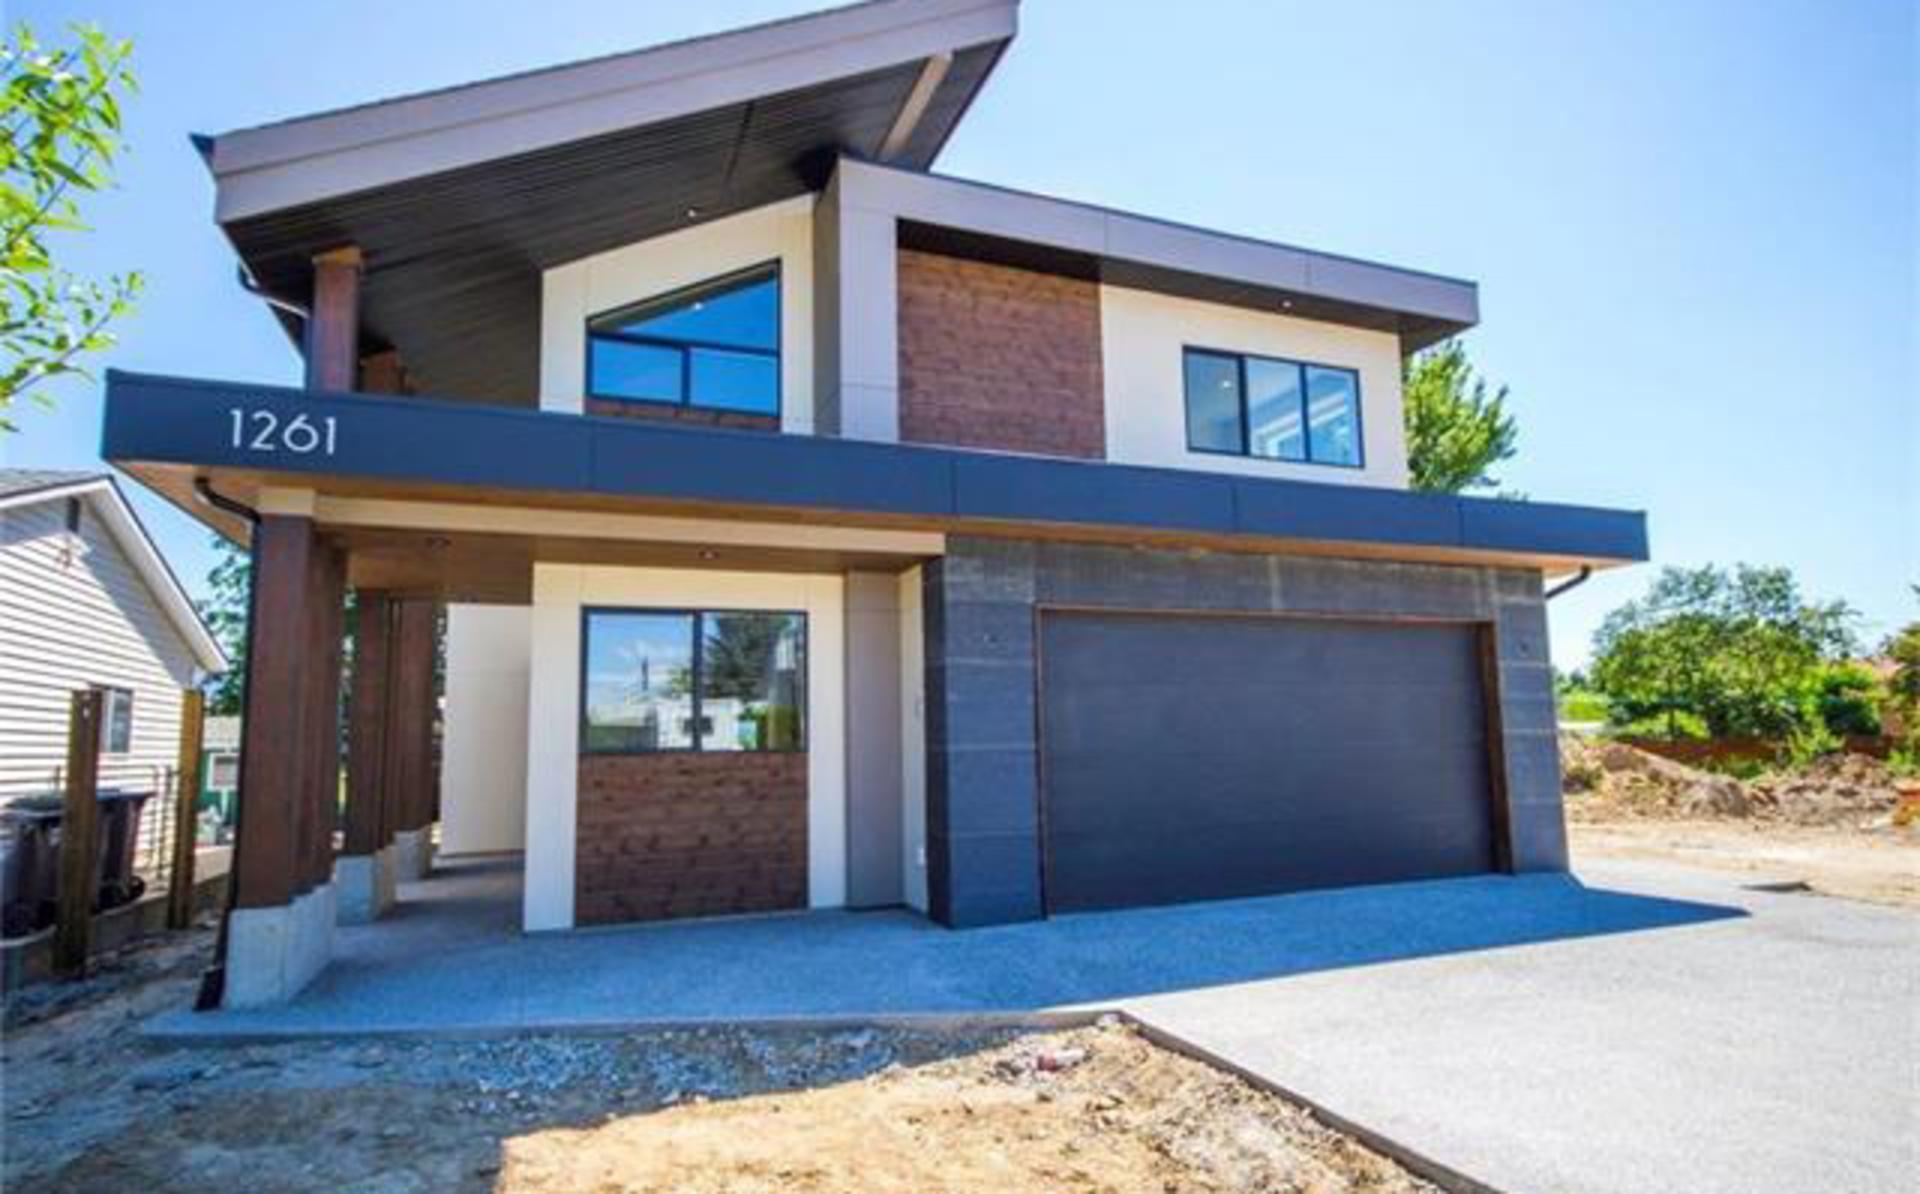 Lower Mission Real Estate  at 1261 Ladner Road, Kelowna, Central Okanagan